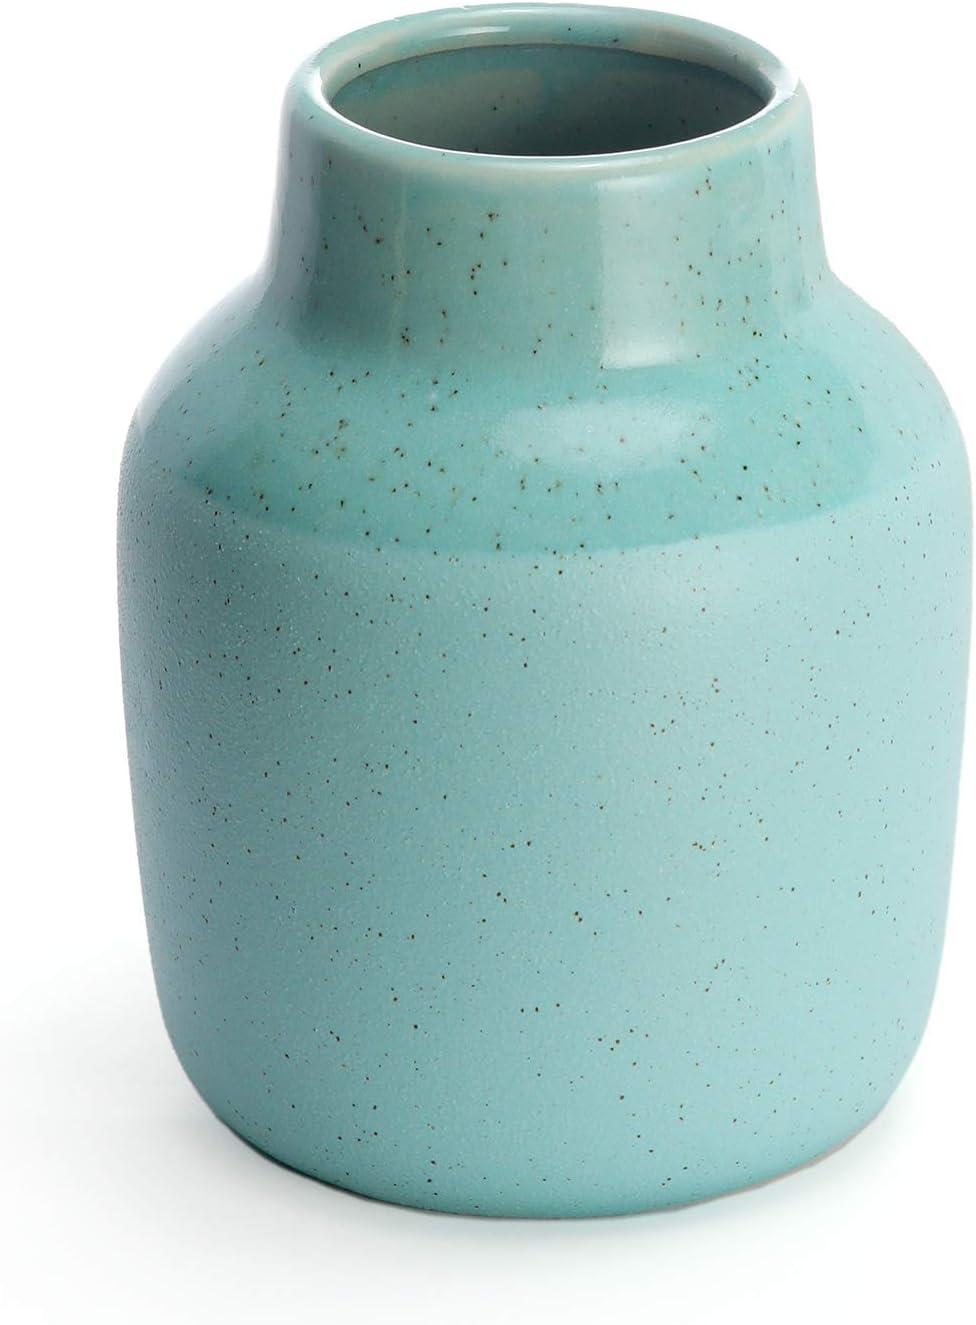 Amazon Com Ceramic Vase For Home Decor Teal Flower Vases For Shelf Mantle Or Table Elegant Living Room Decorations For Tables Decorative Home Accents And Unique Centerpieces Kitchen Dining